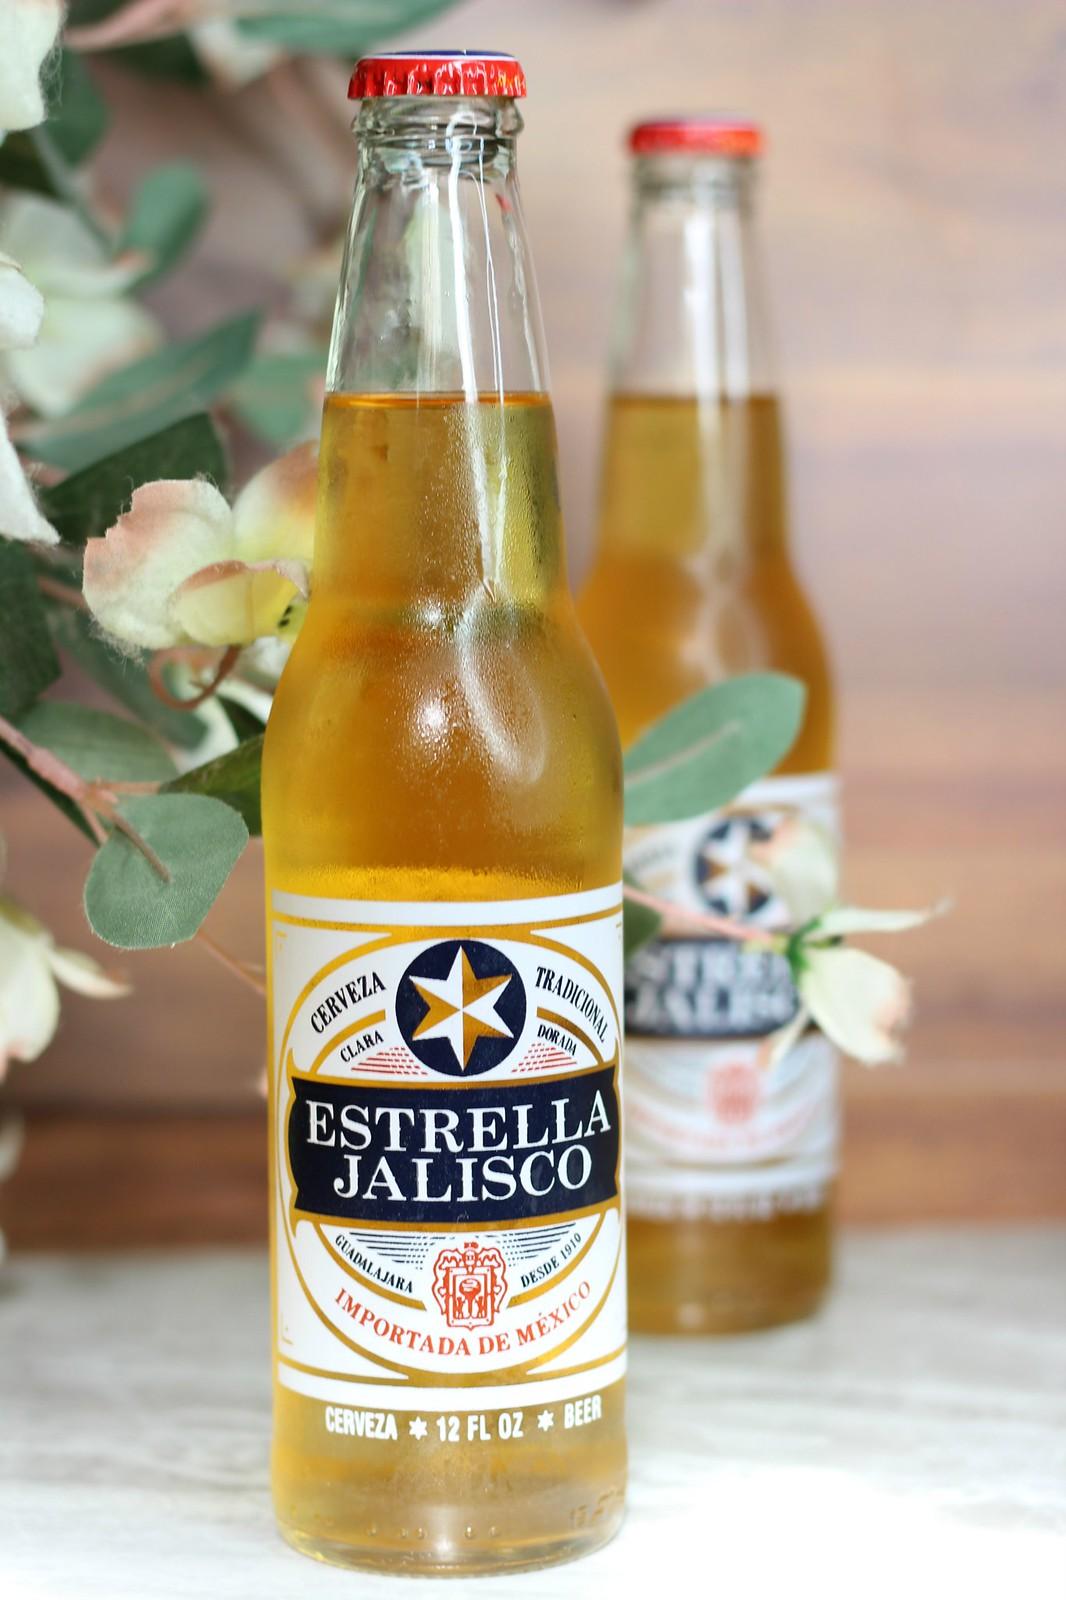 Celebrate with Estrella Jalisco